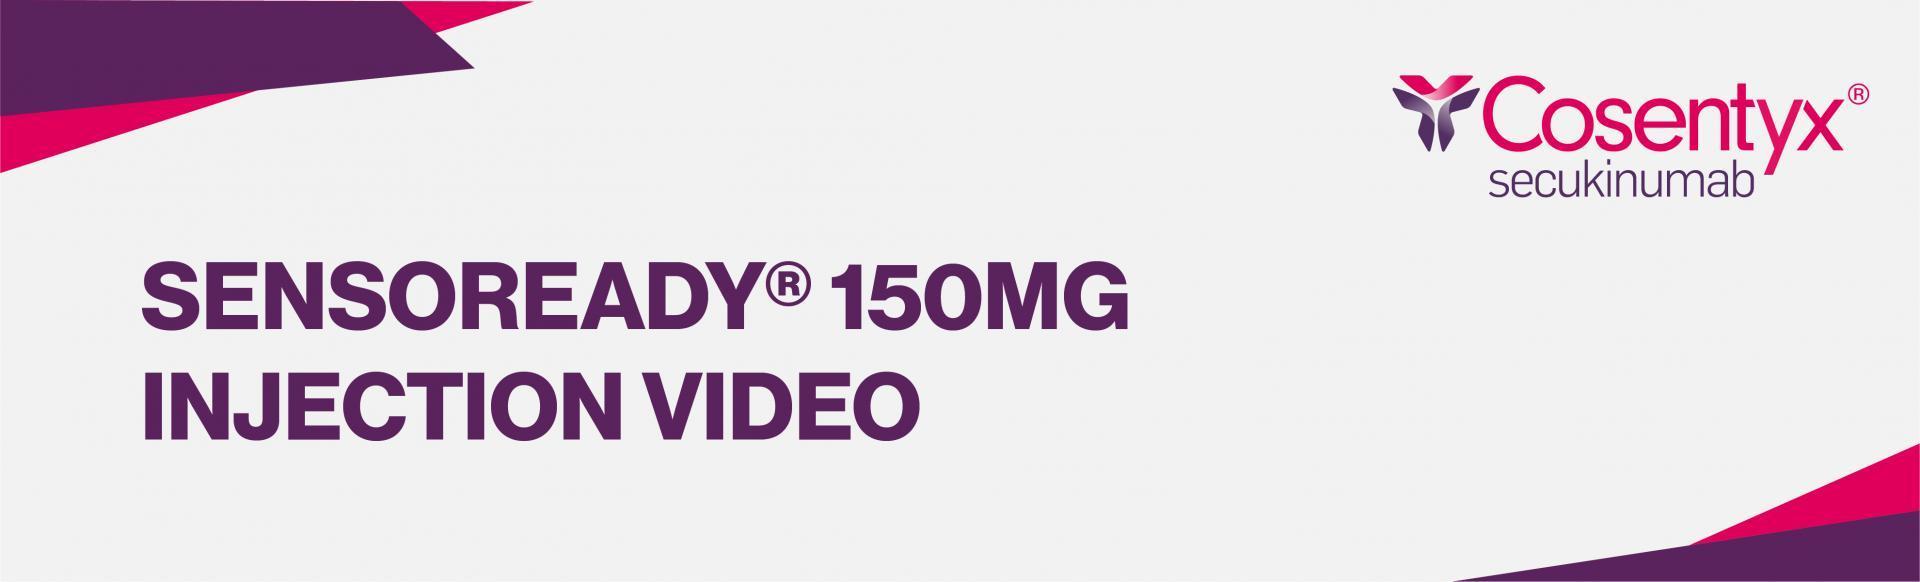 Top banner: sensoready 150mg injection video